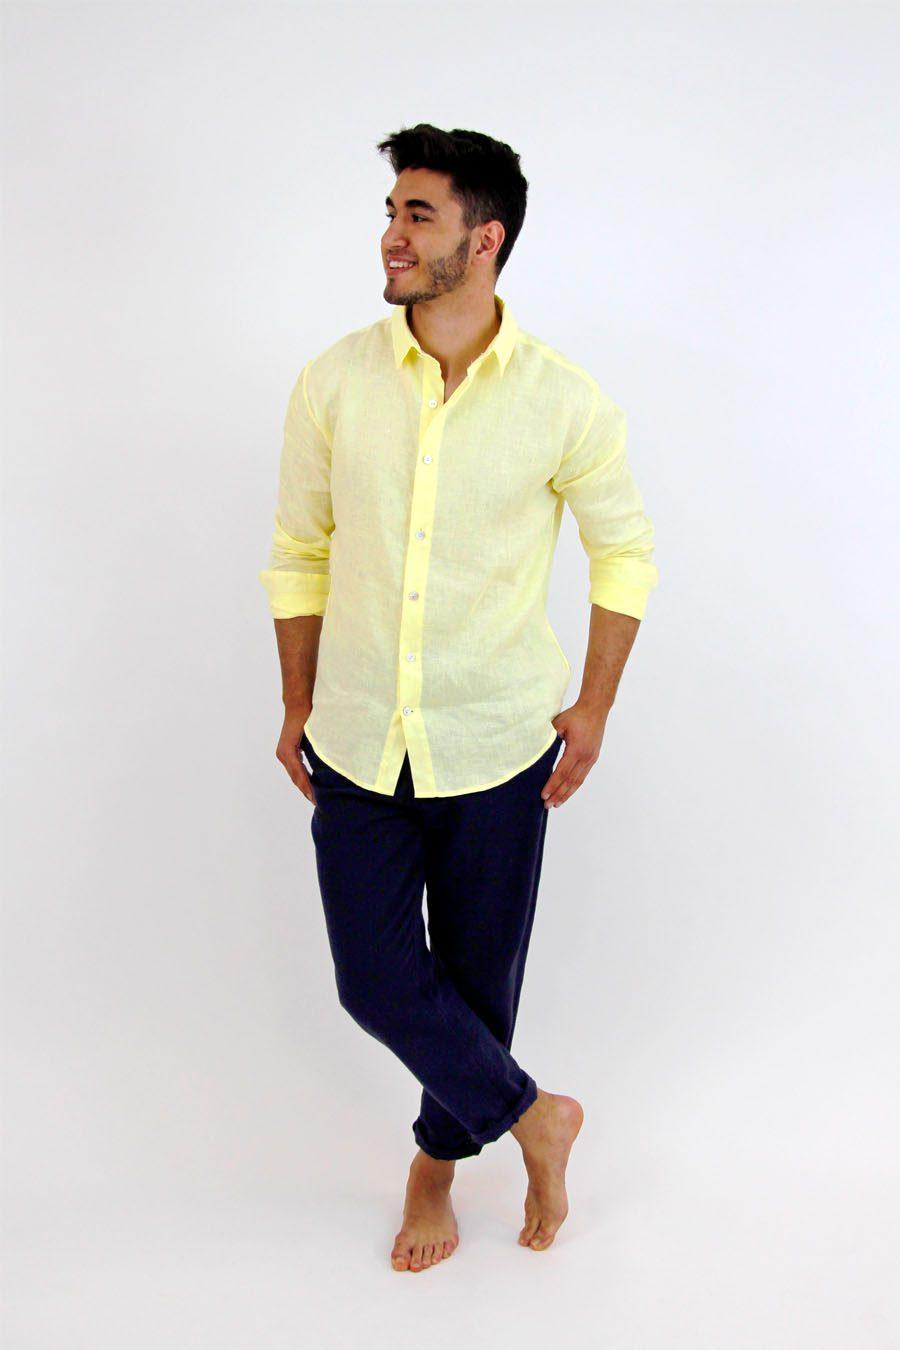 SHIRT FORMENTERA - XXL - Yellow